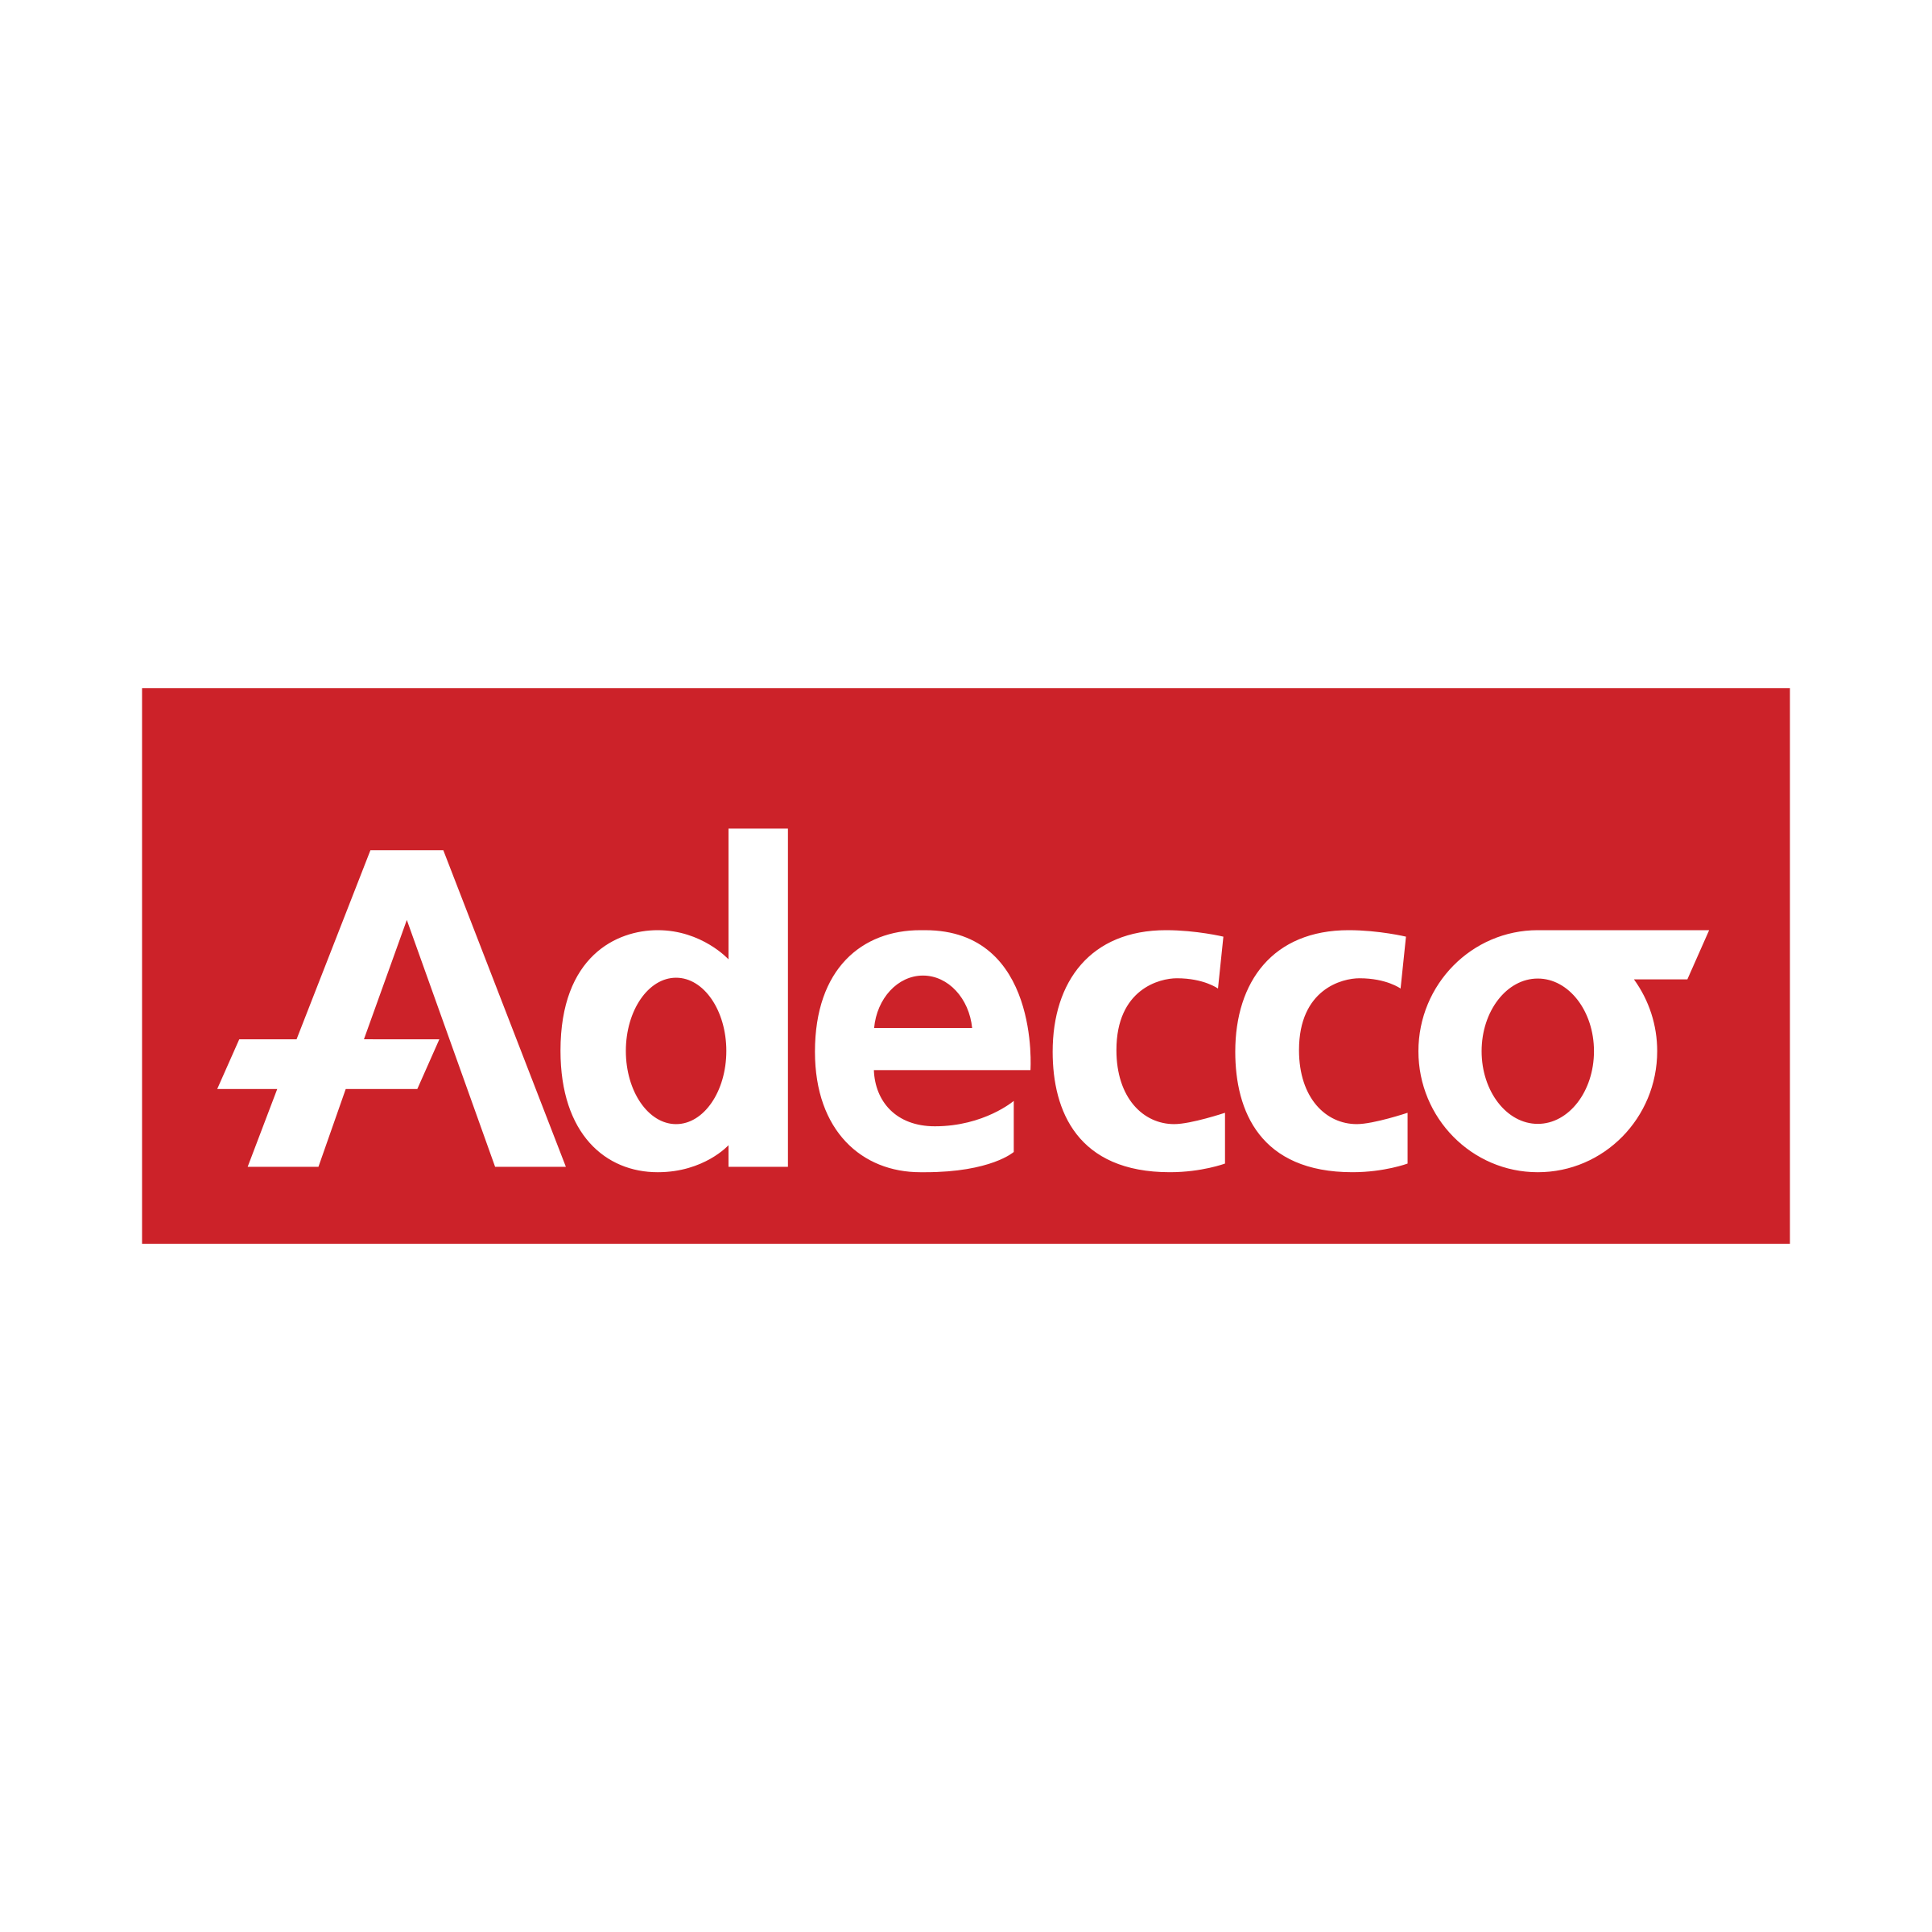 Adecco Logo PNG Transparent & SVG Vector.